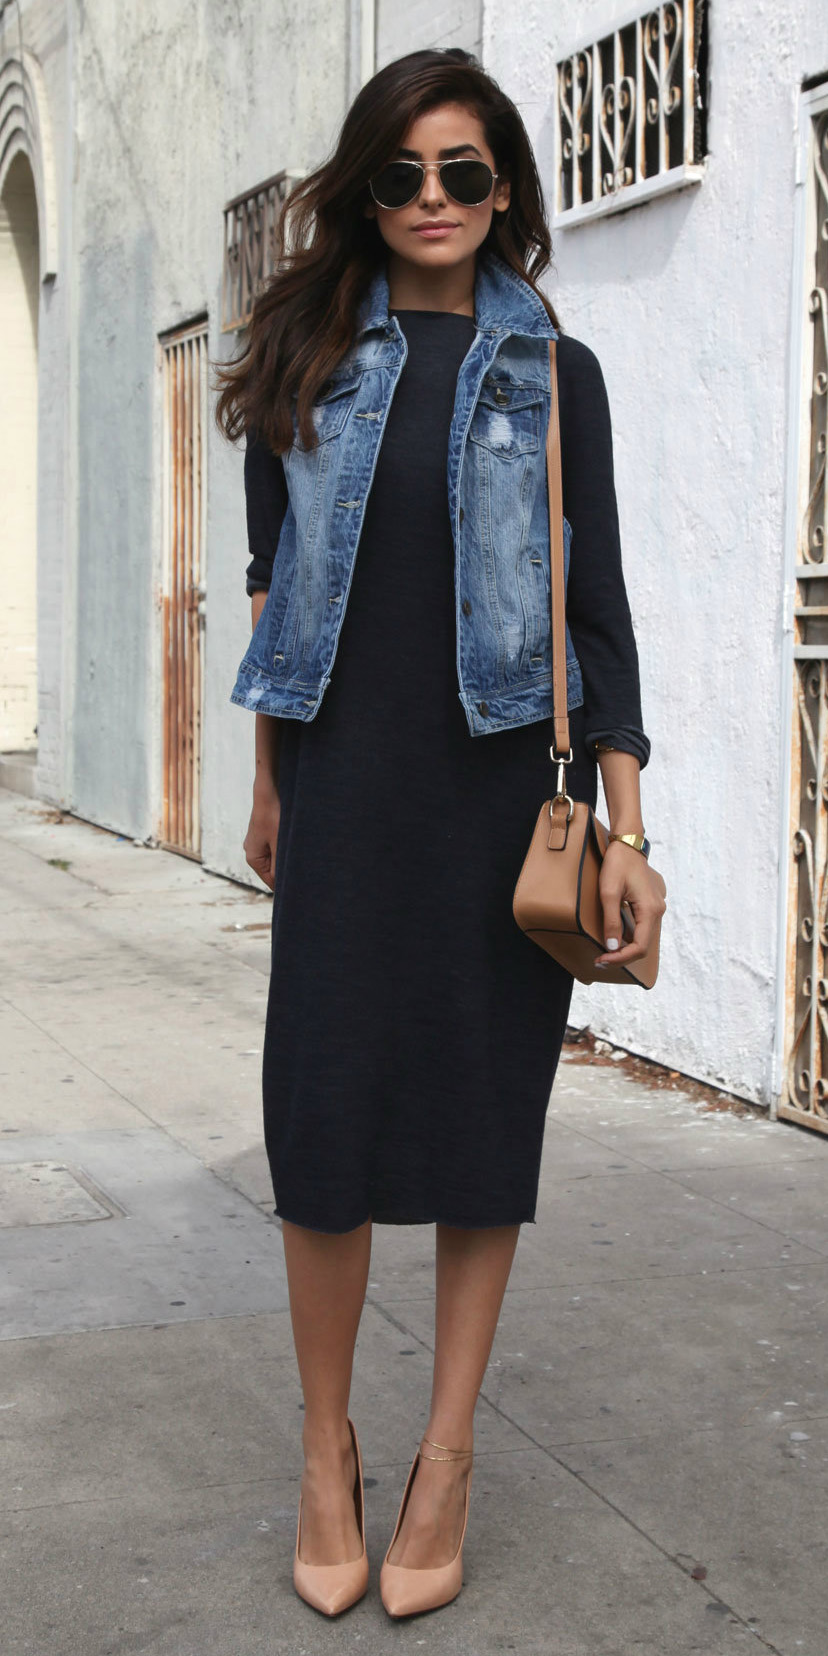 black-dress-bodycon-blue-med-vest-jean-tan-bag-tan-shoe-pumps-sun-brun-fall-winter-lunch.jpg